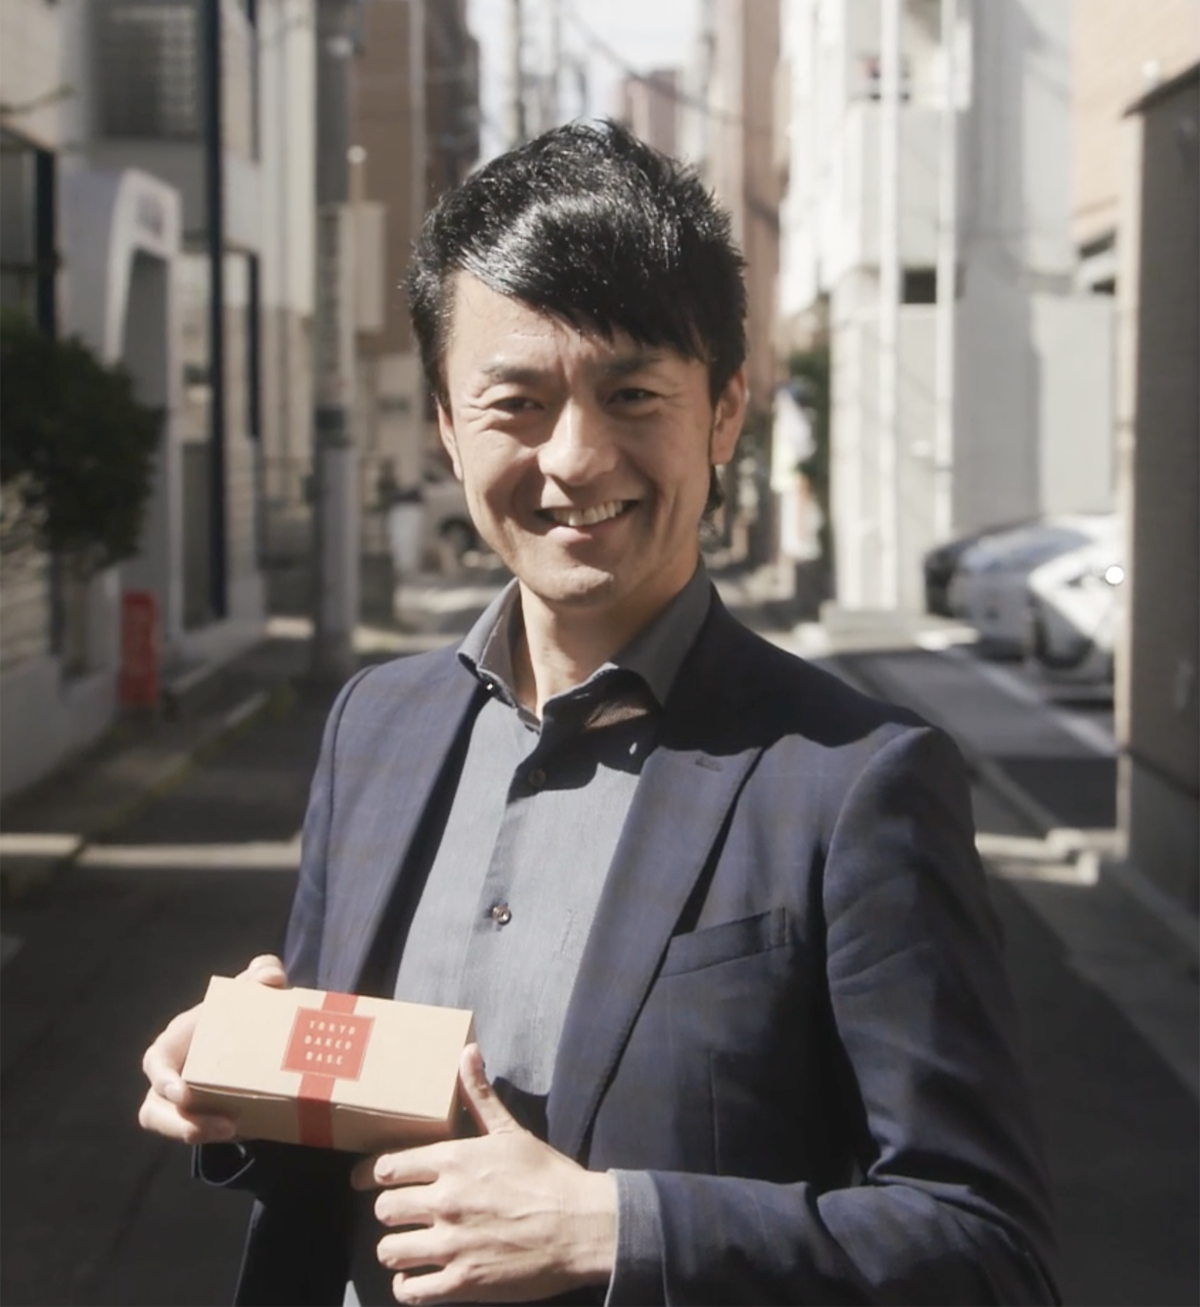 Founder of Fuubian, Hisashi Kawagoe